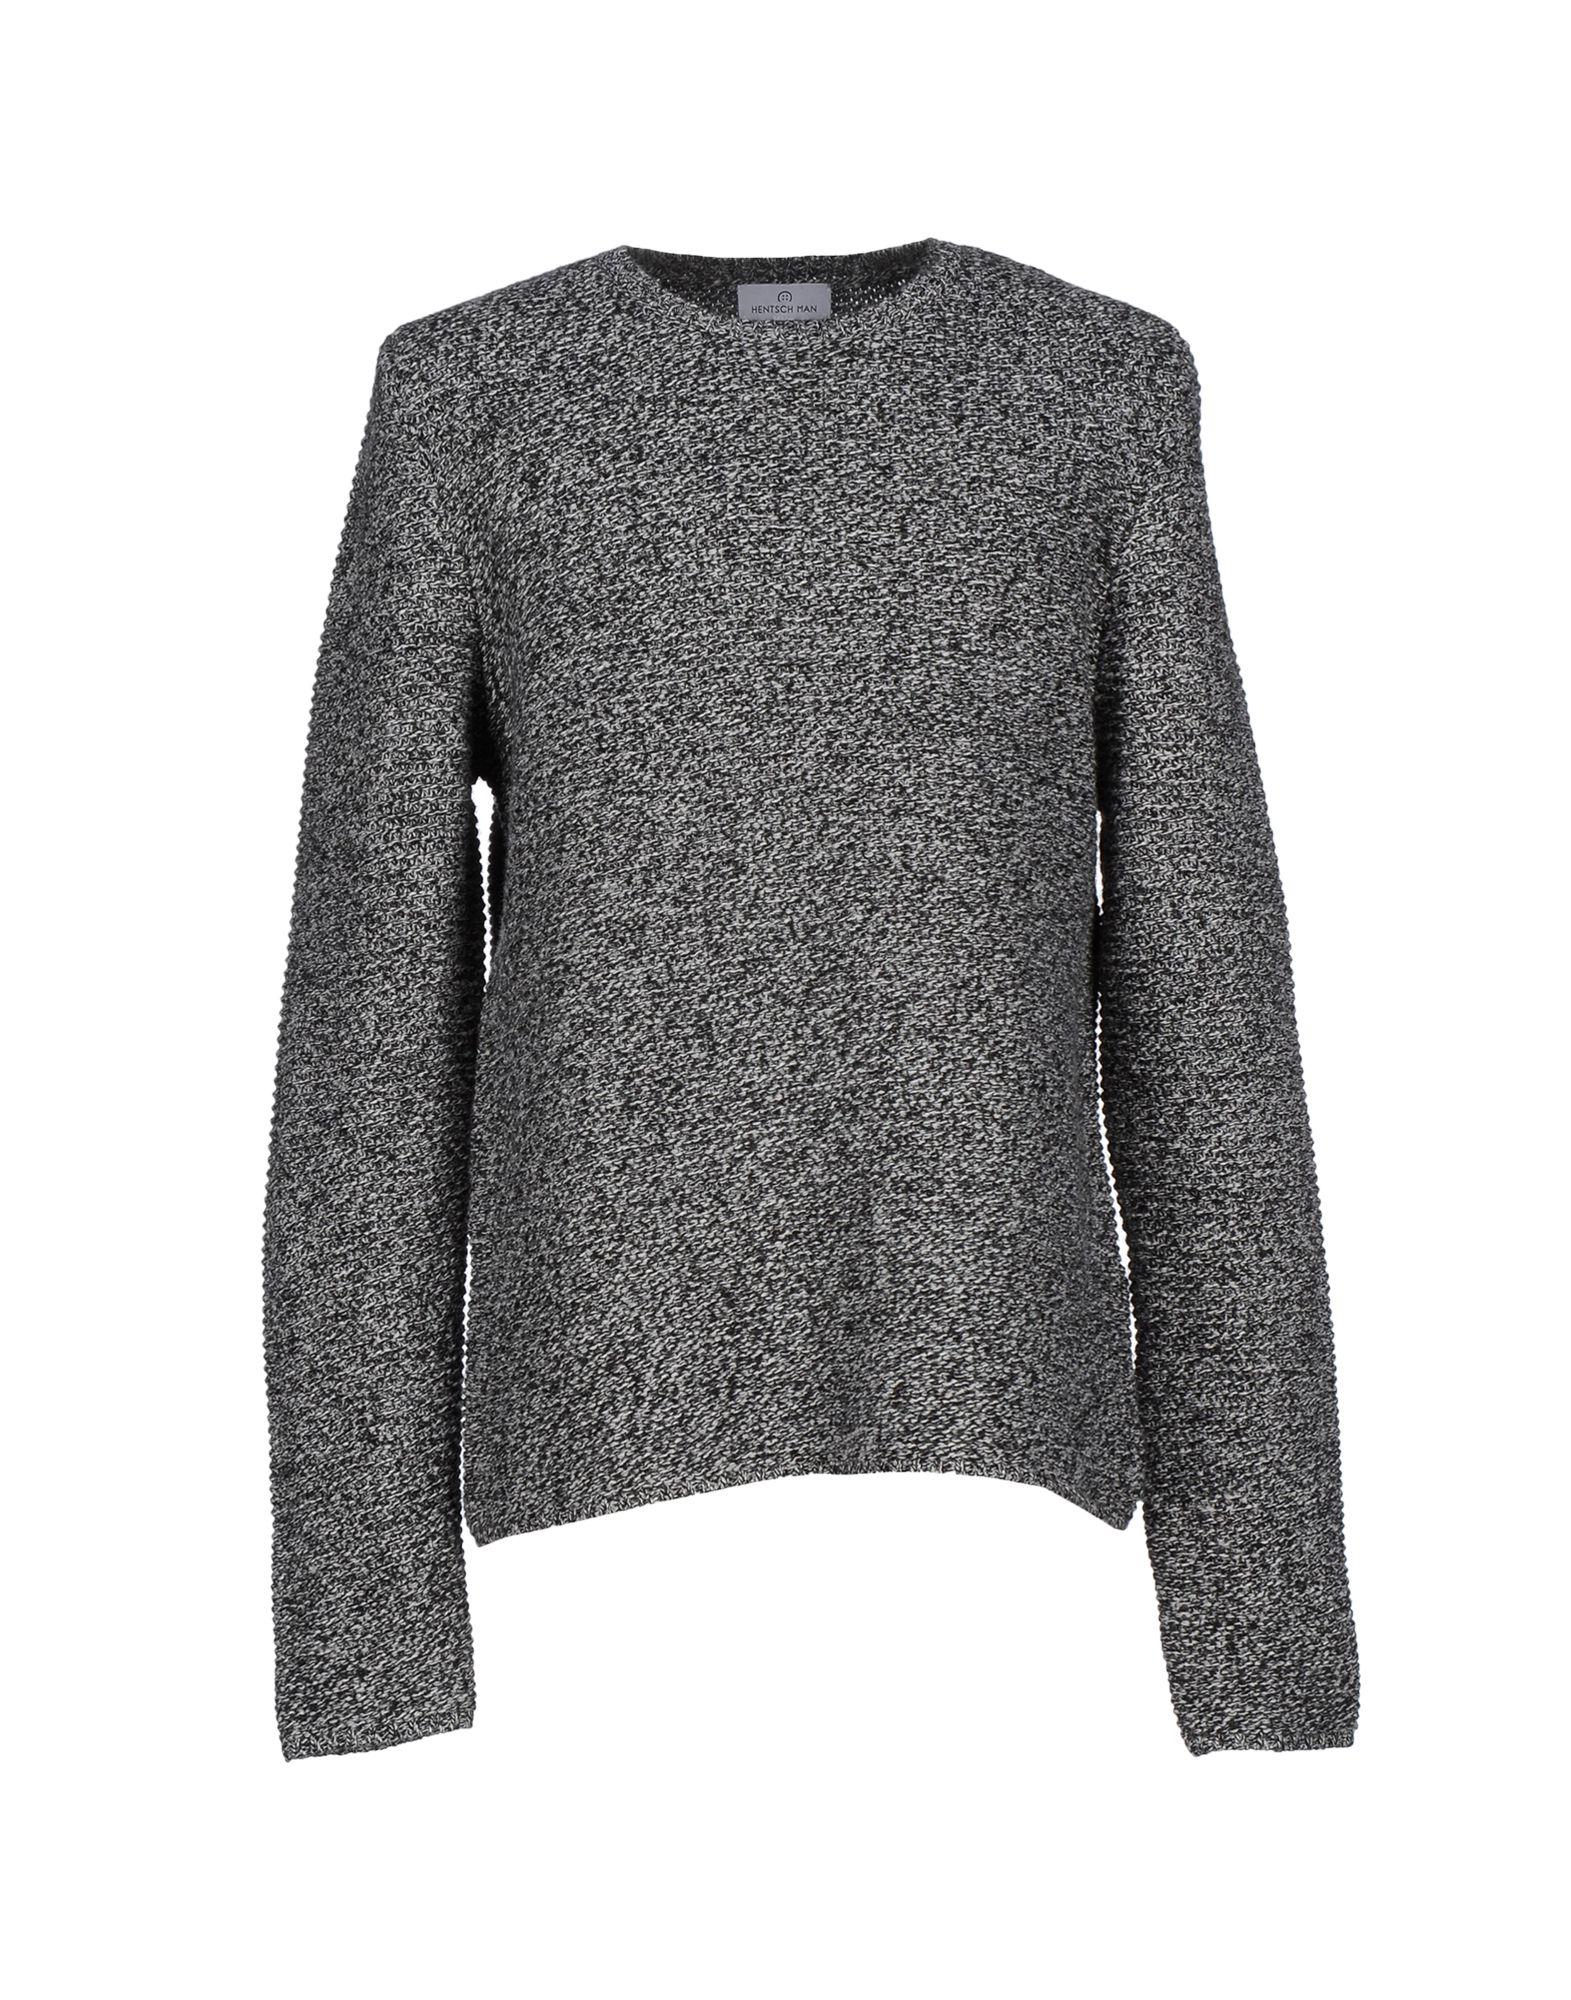 HENTSCH MAN Sweaters in Grey